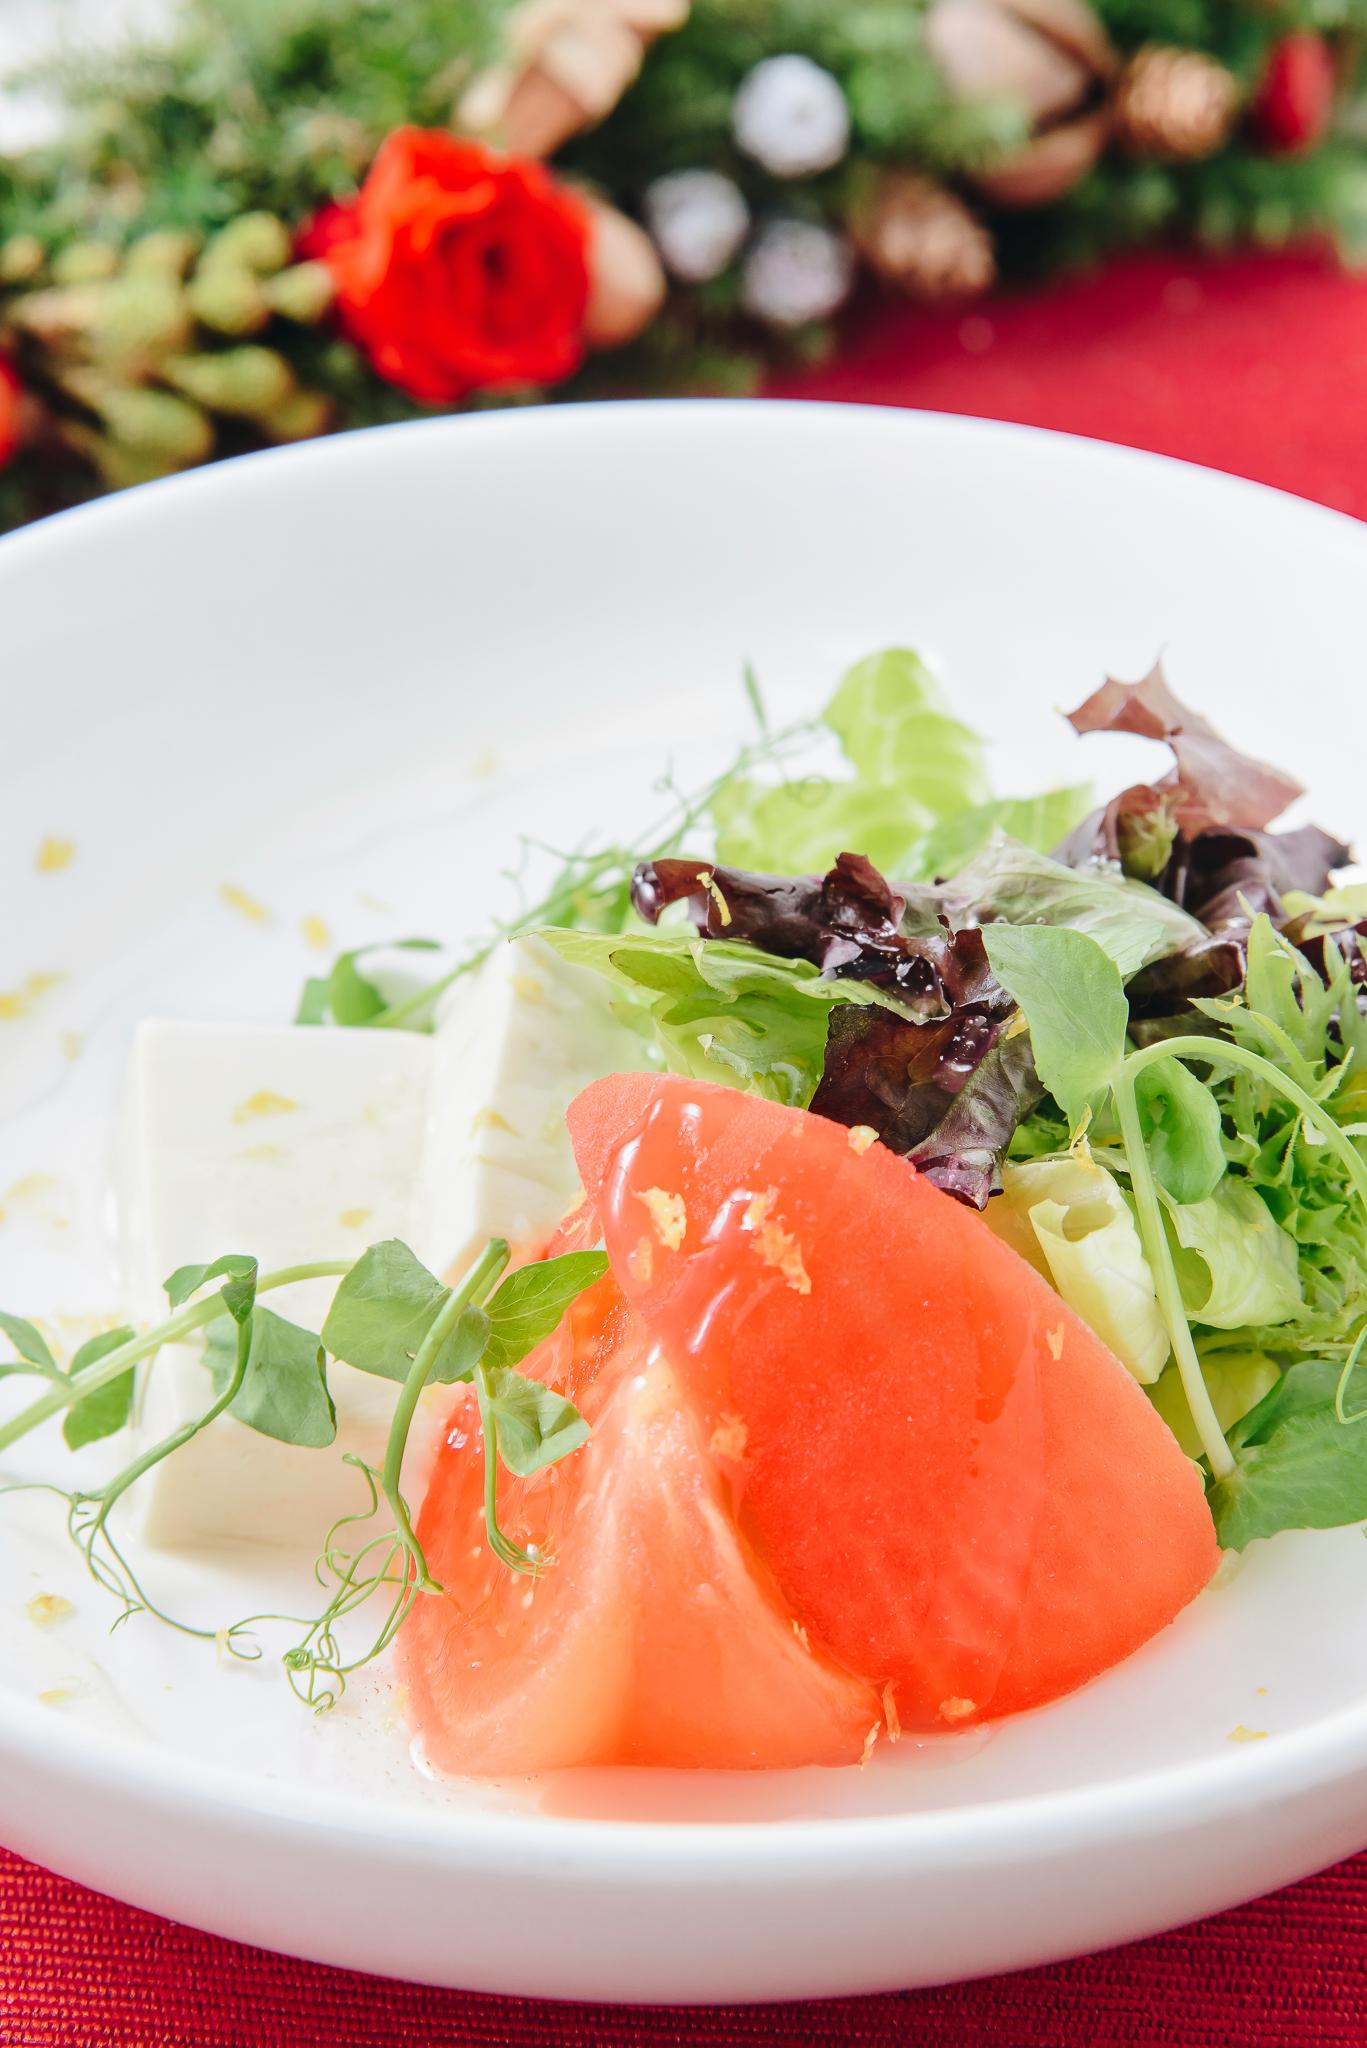 檸檬話梅浸蕃茄, 豆腐沙津 配檸檬汁  preserved lemon plum juice tomato, tofu salad with lemon dressing